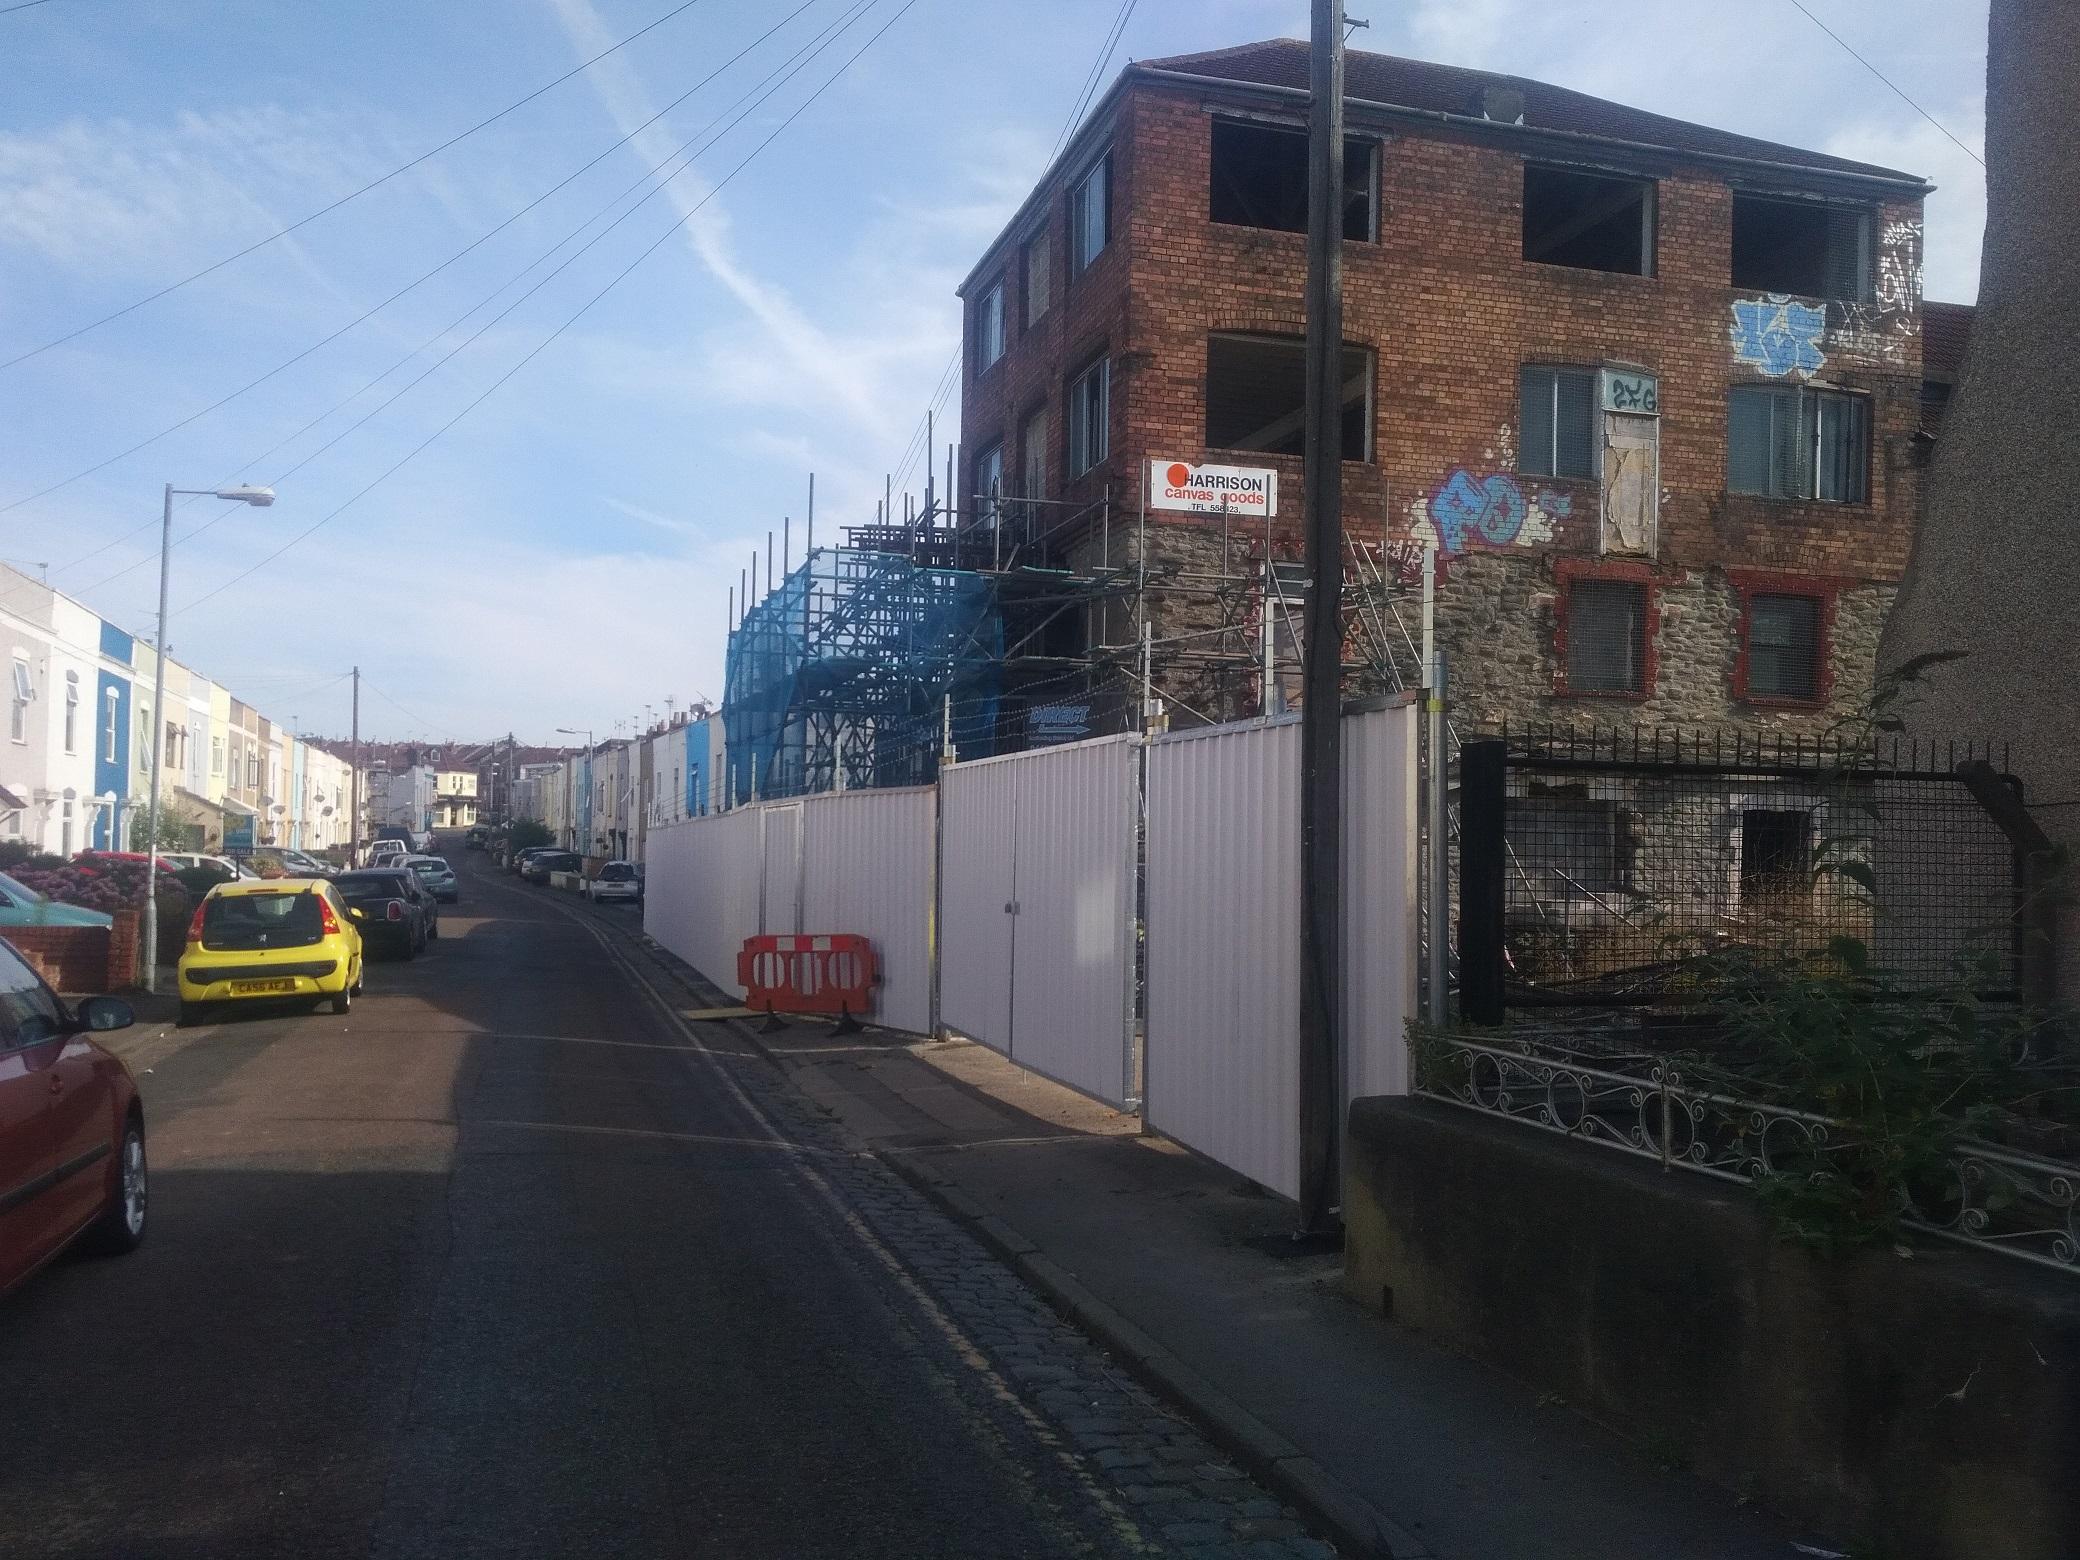 [photo] Lyppiatt Rpad after new hoardings erected